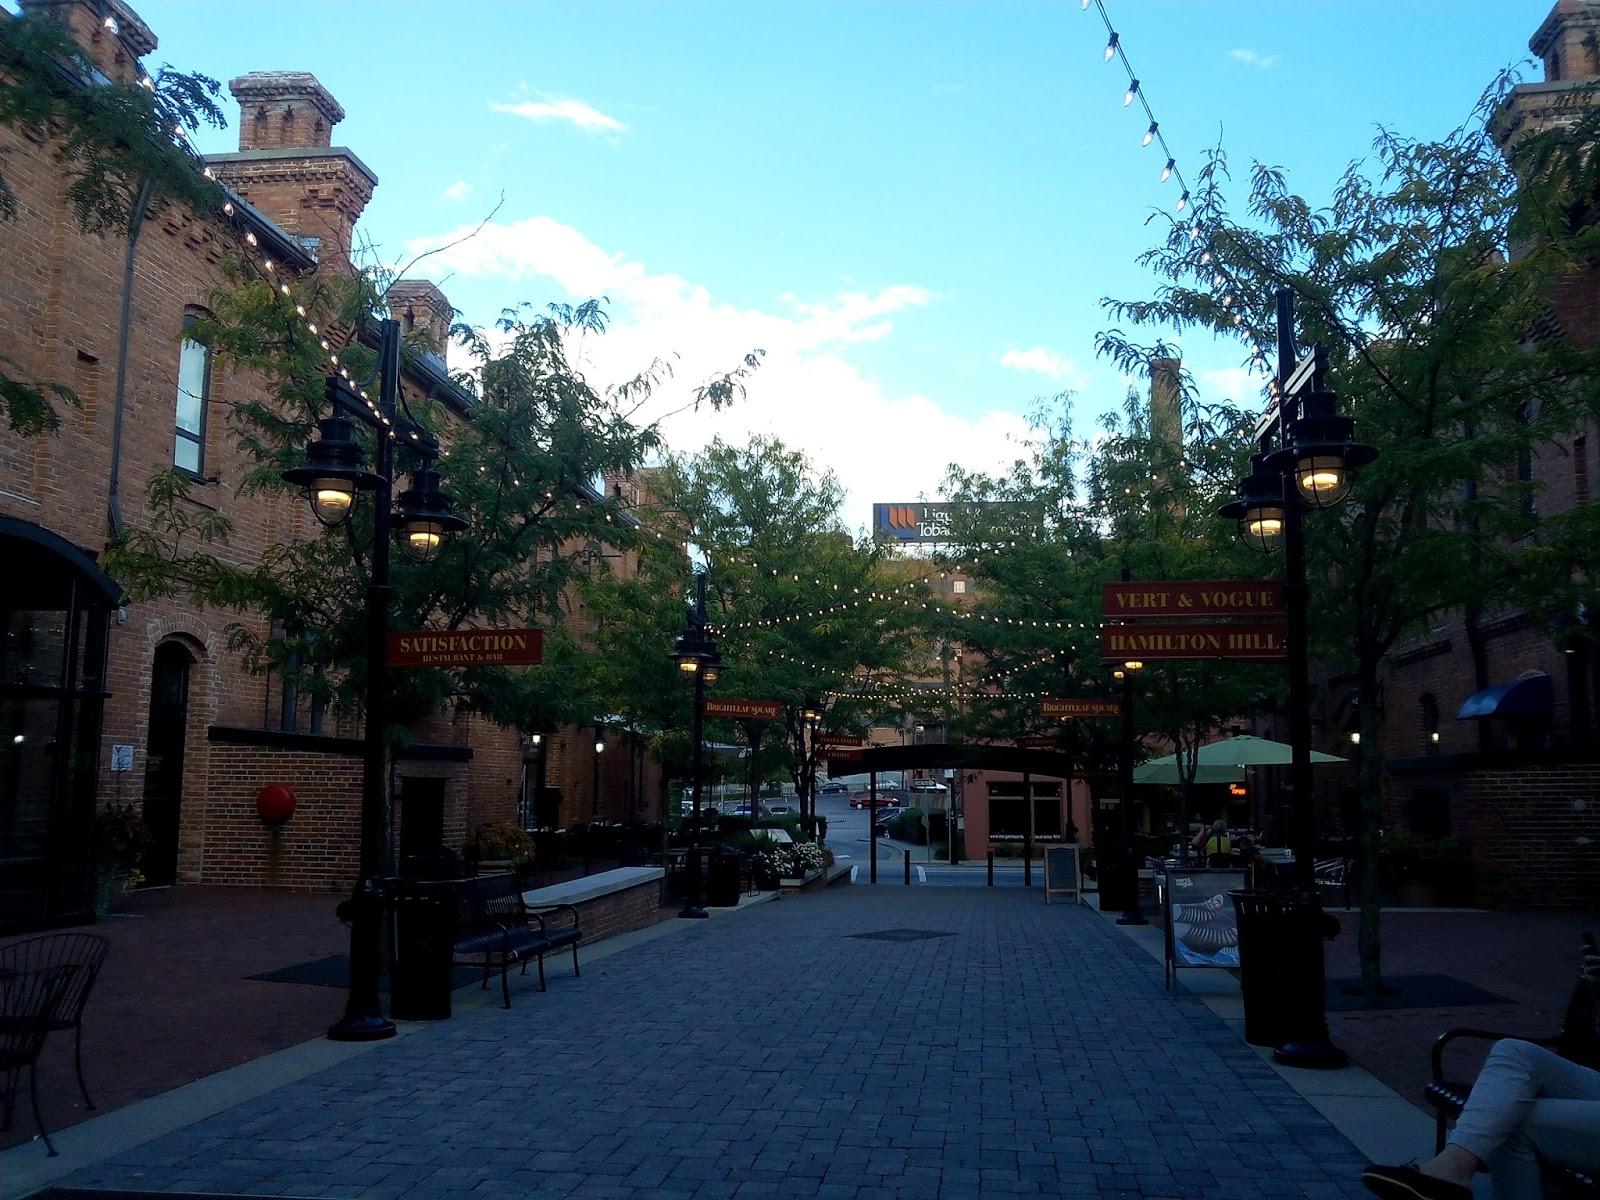 Durham, north carolina, usa, expatriation, expatriation, brightleaf, main street,